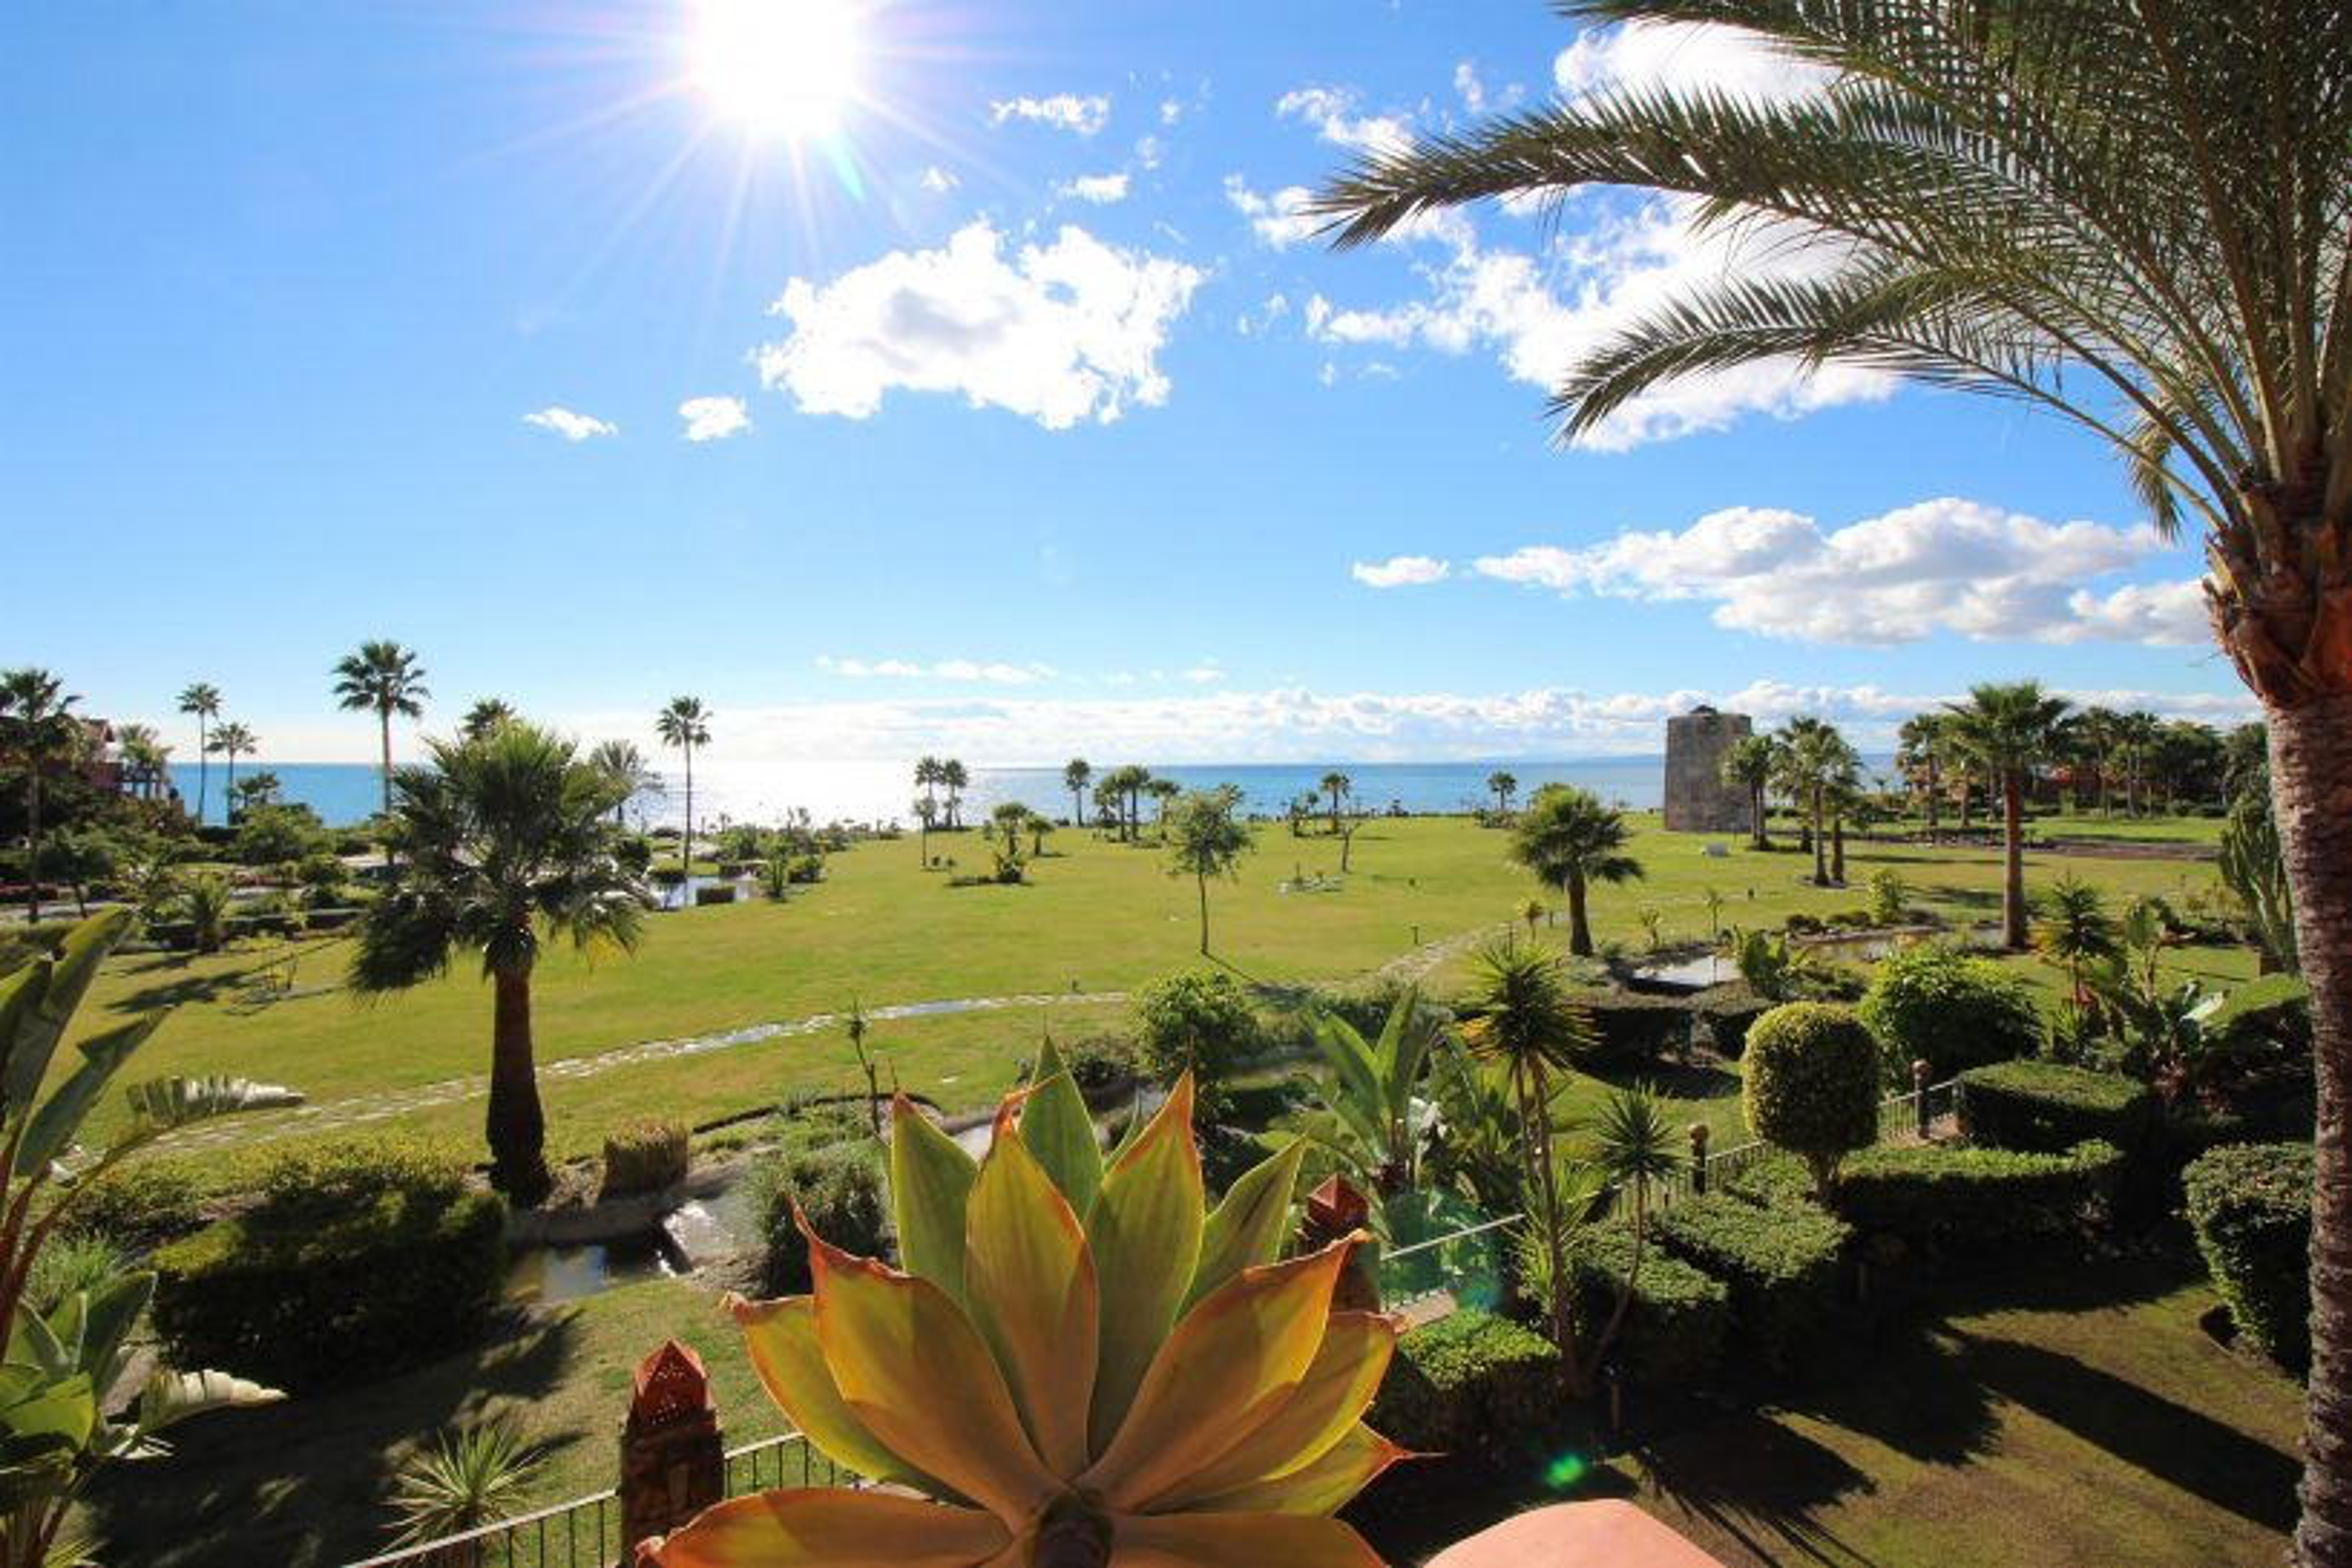 Record year predicted for Costa del Sol Tourism